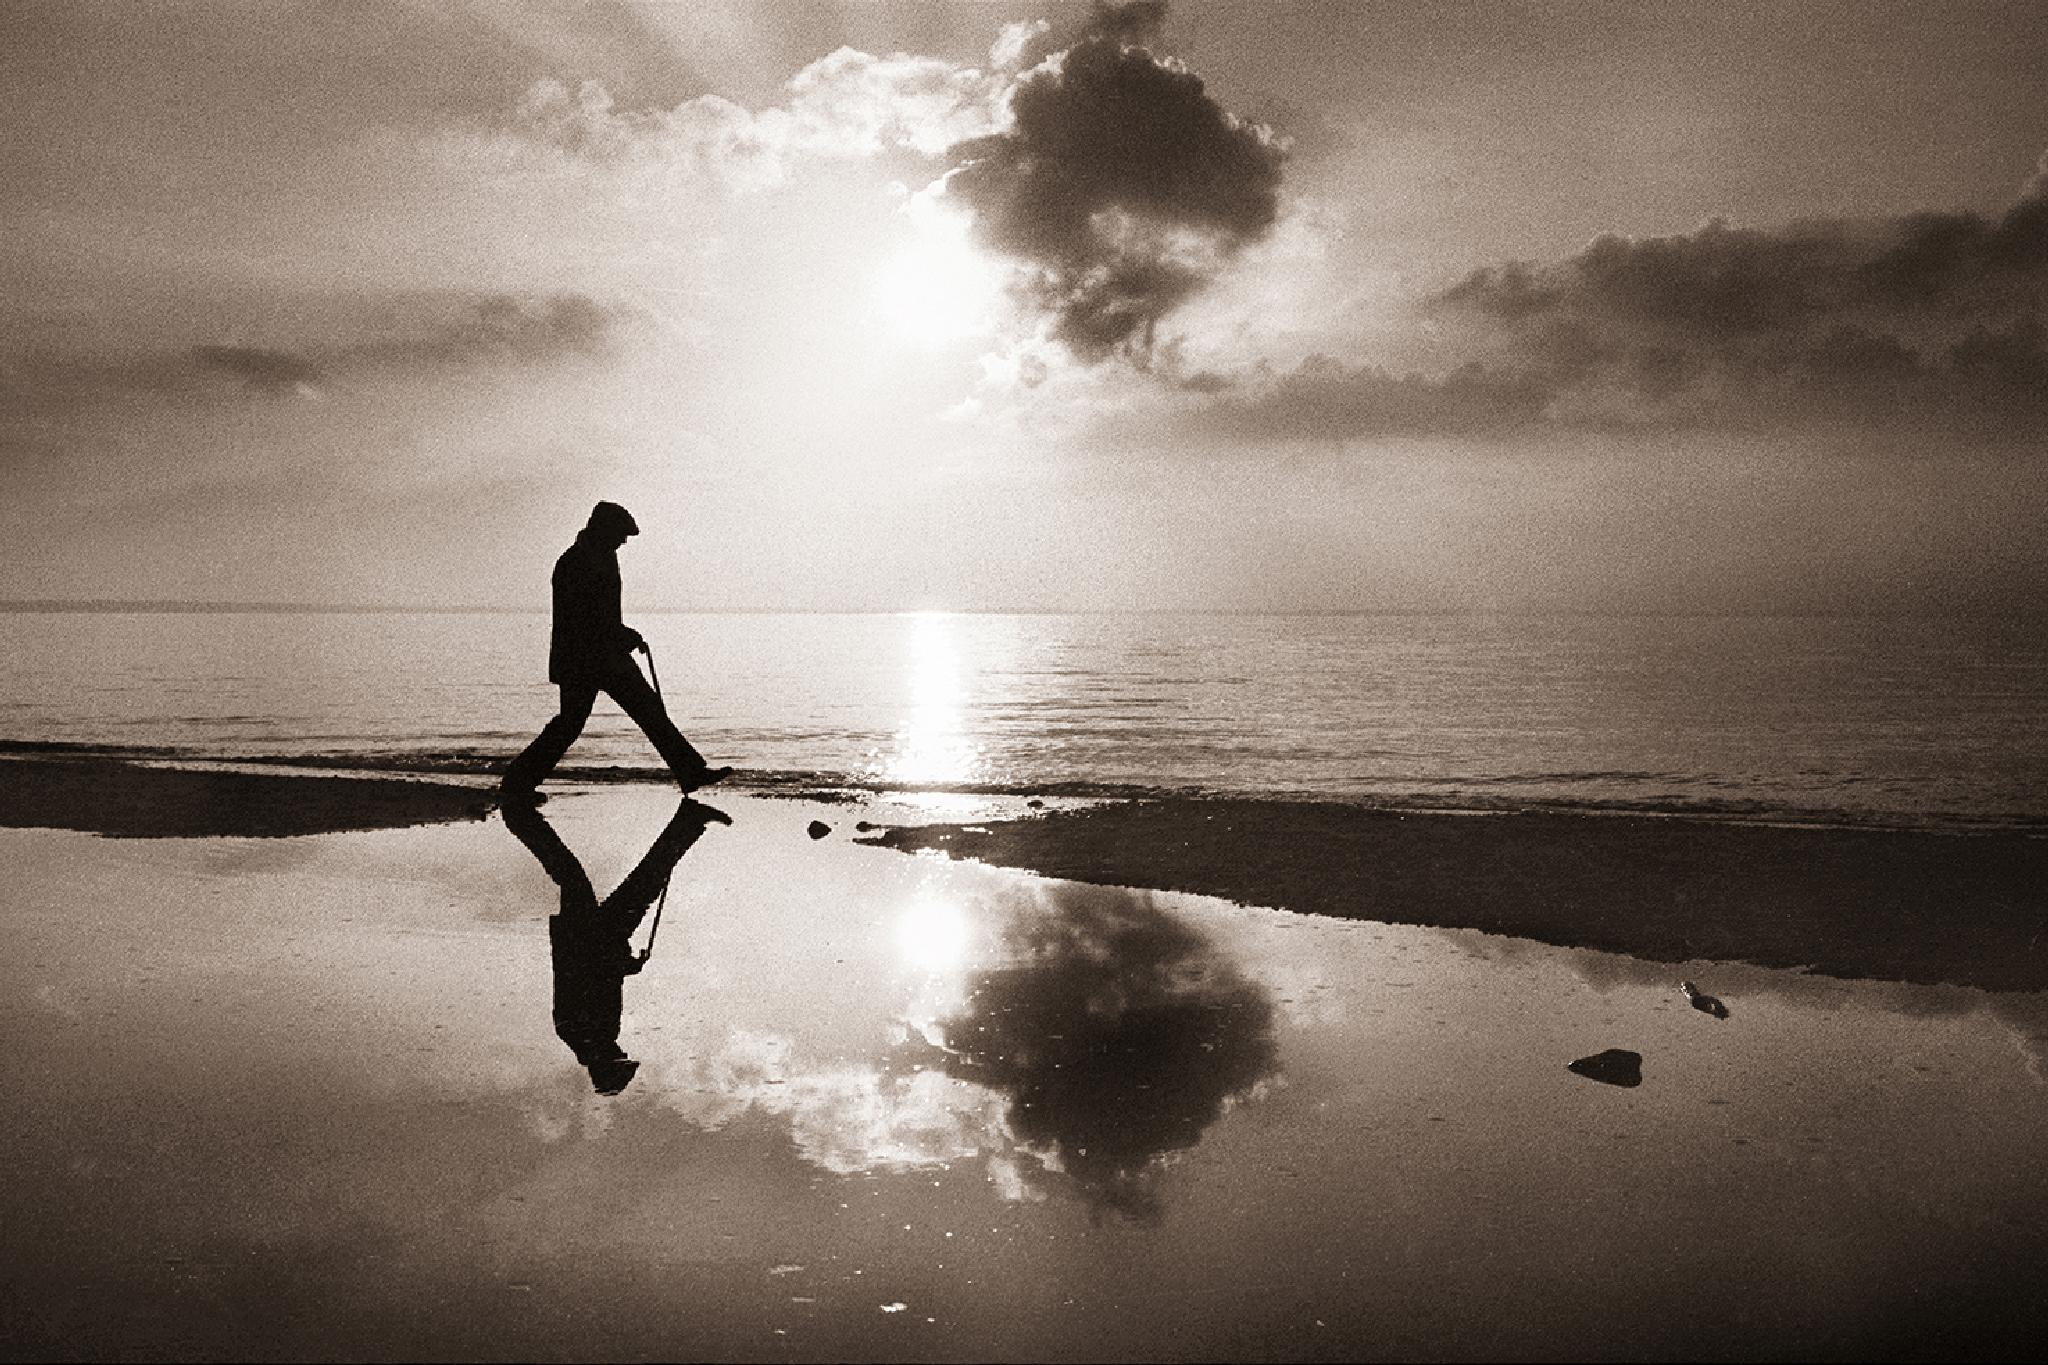 Reflection by fredrik.rege.5